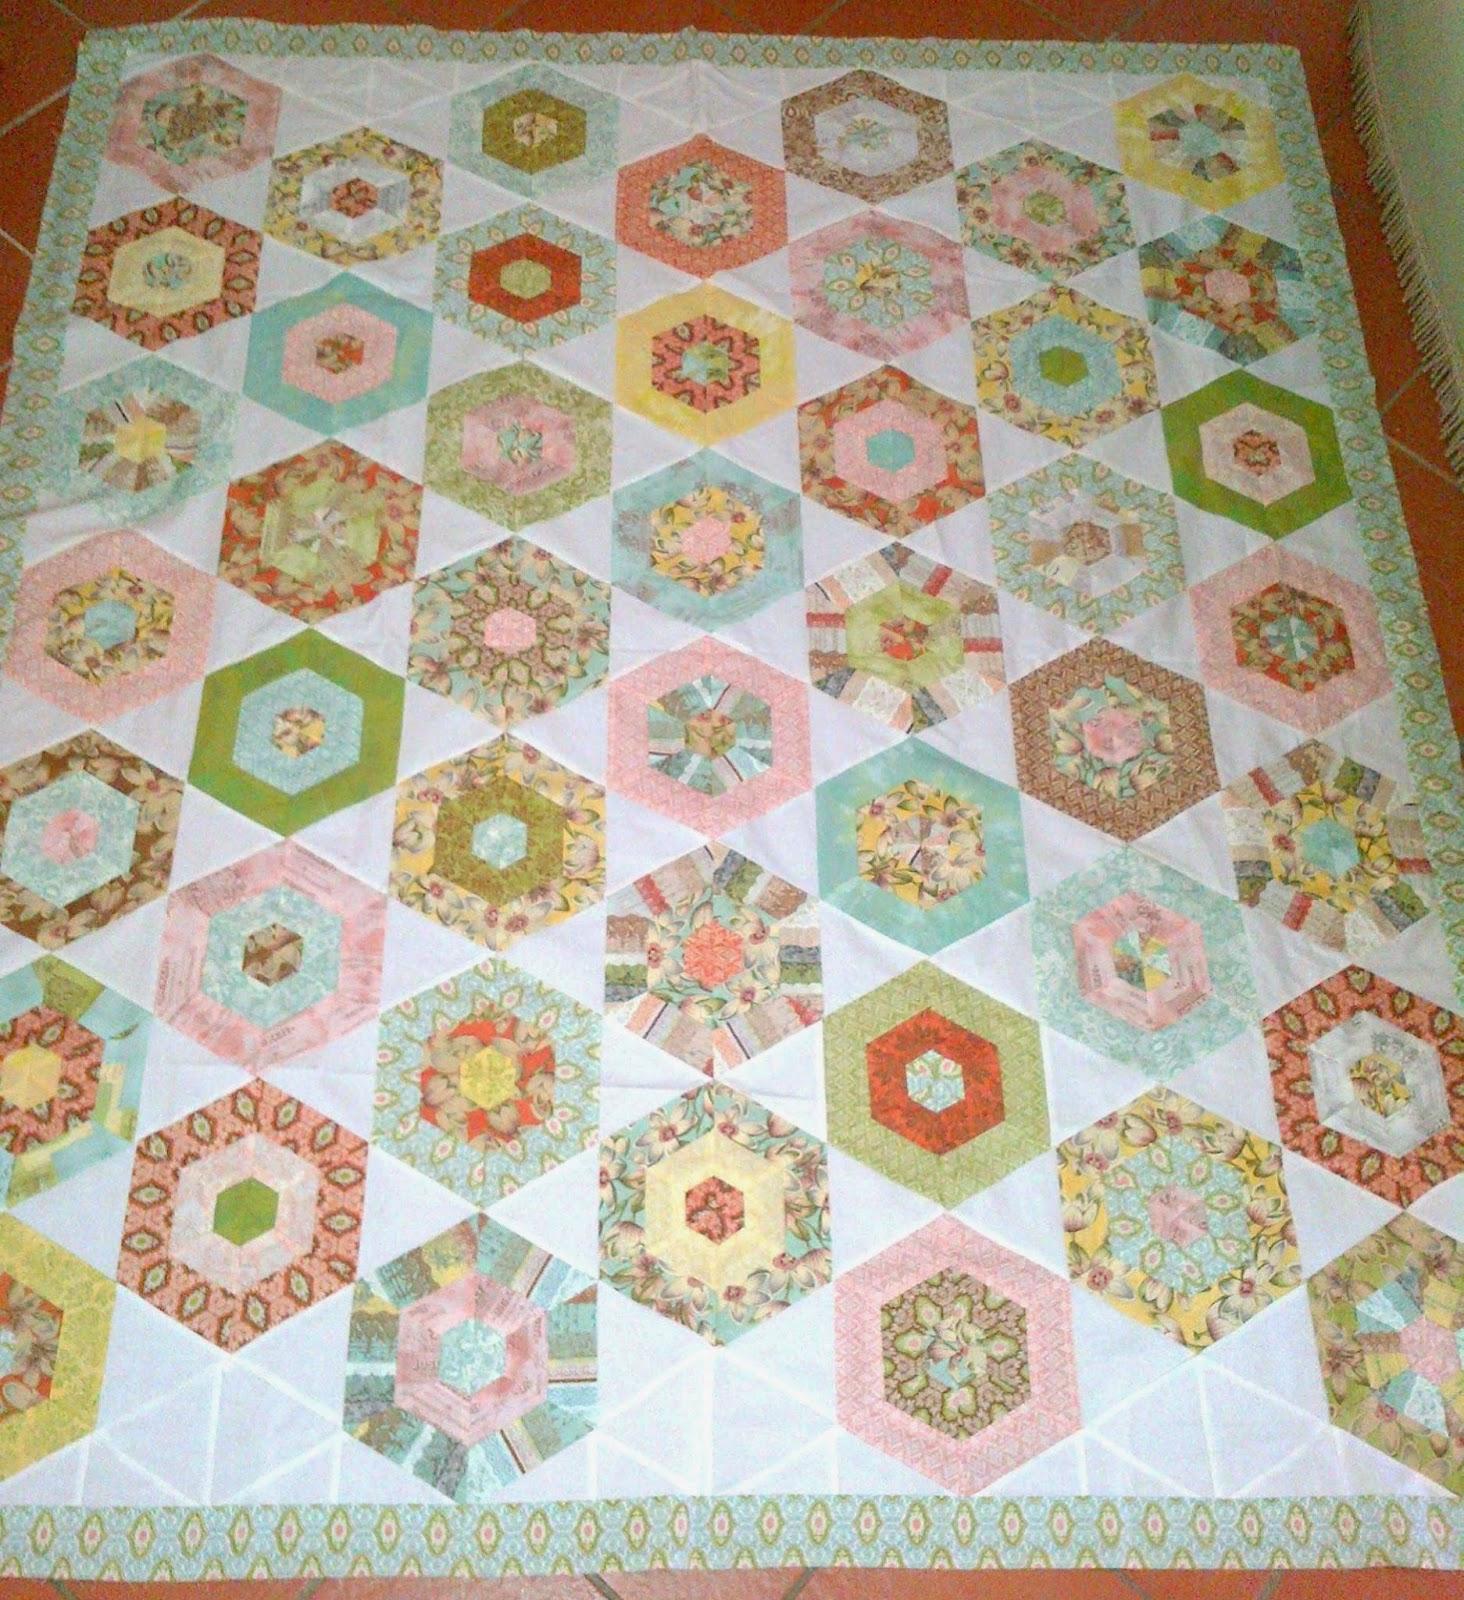 Quilting Template Hexagon : Cape Pincushion: Curio Jelly Roll Hexagon Quilt Tutorial